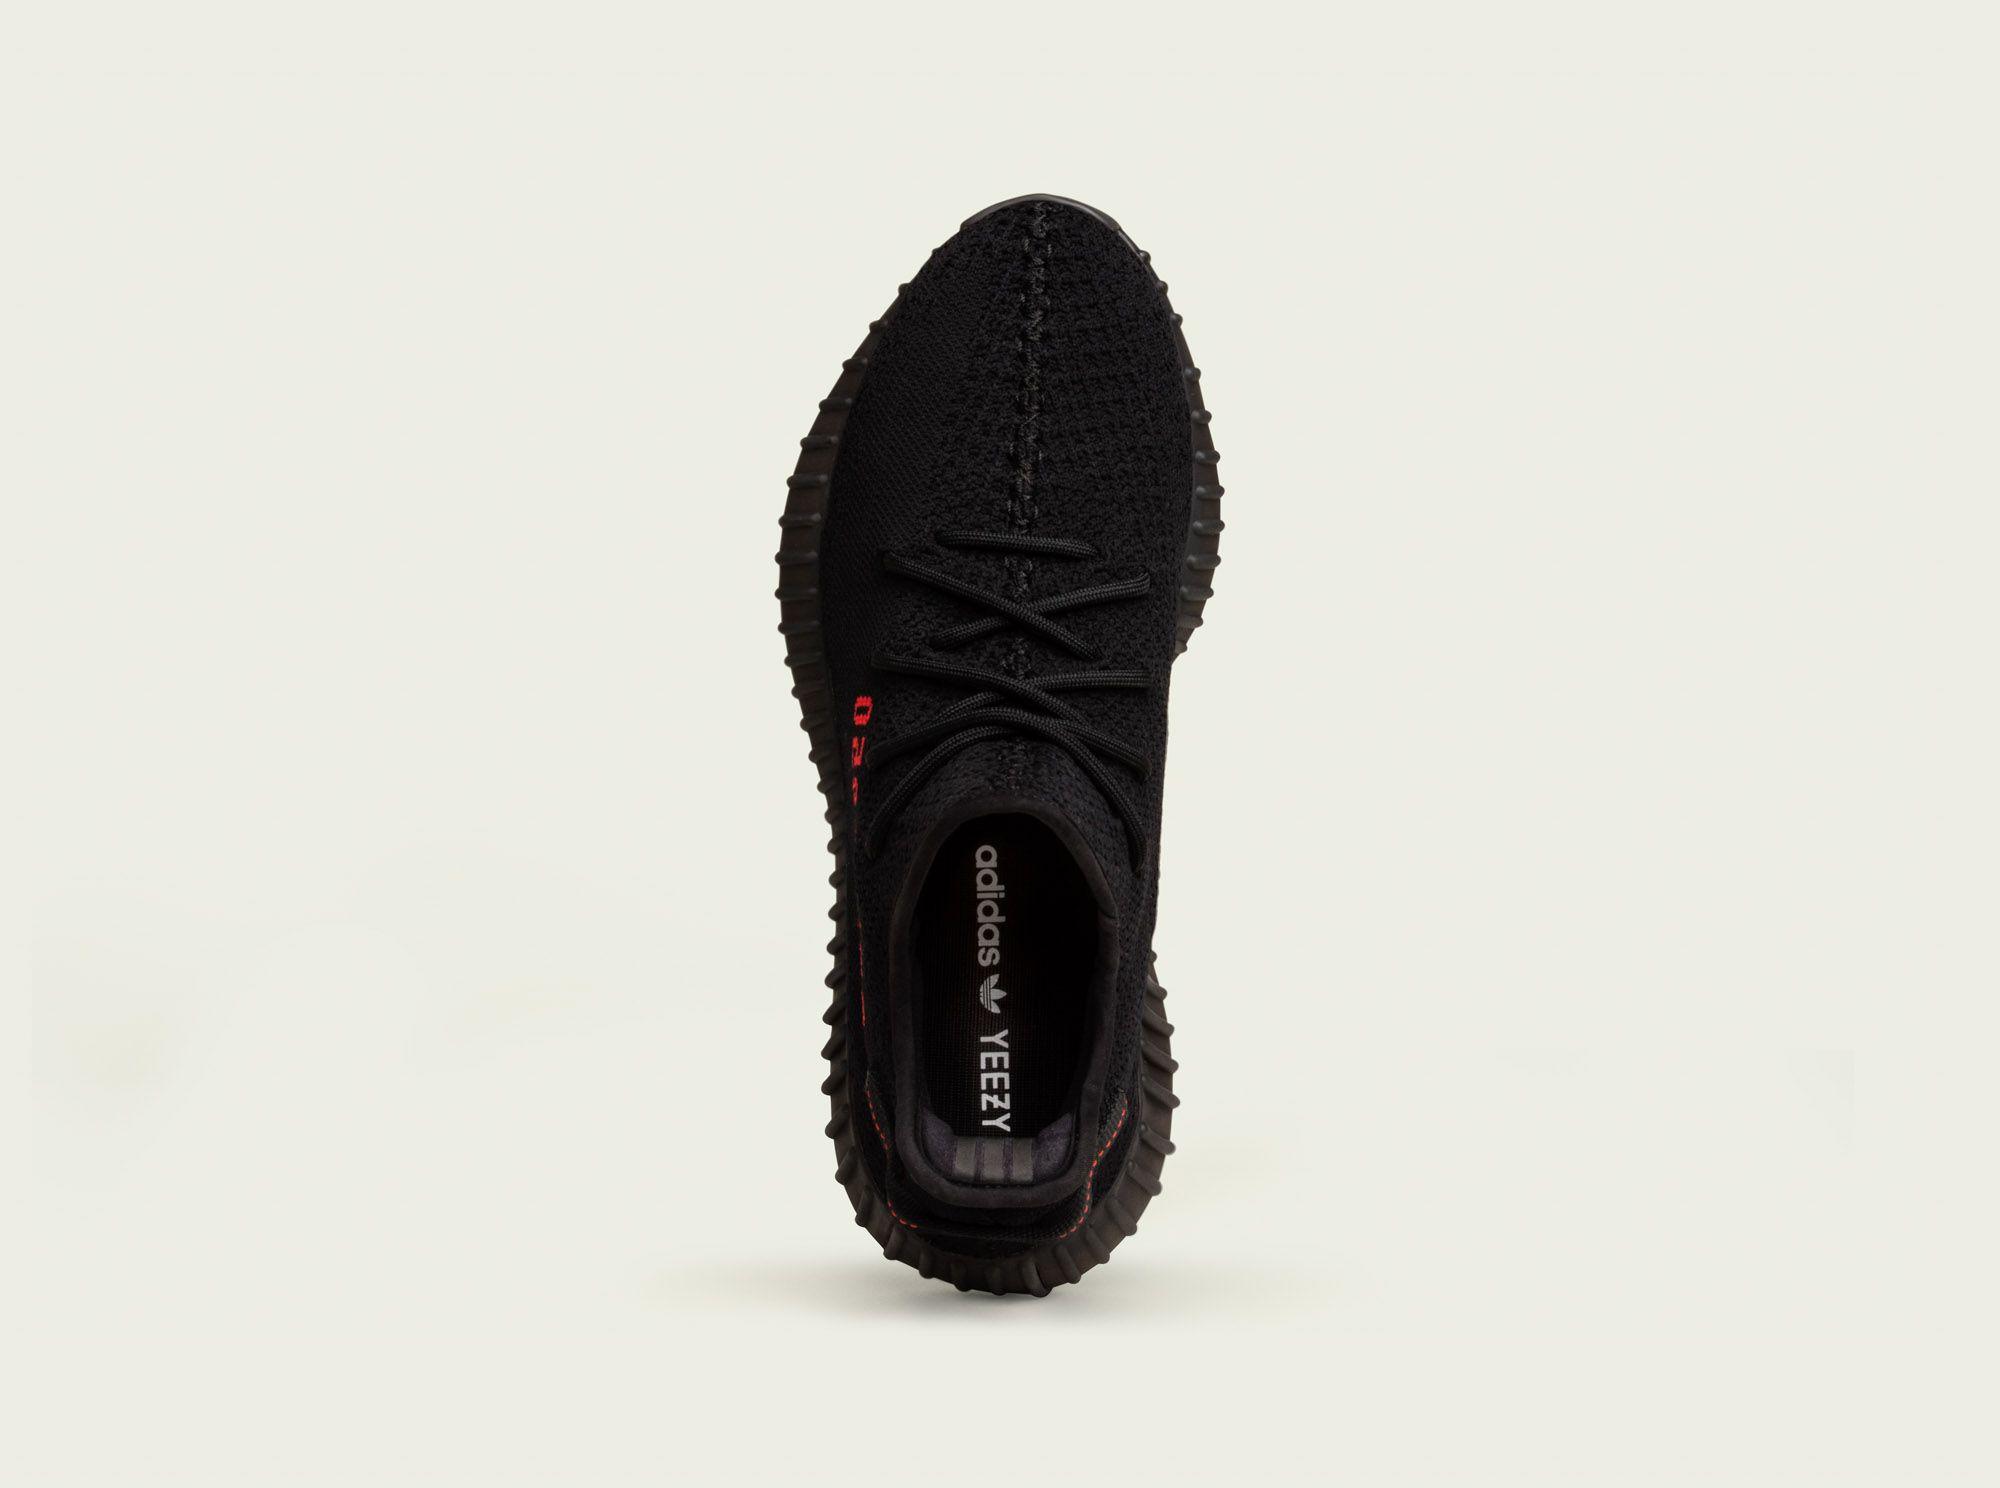 innovative design a96f4 8eeee adidas Yeezy Boost 350 V2 – Black  Red Release Infos, adidas  adidasOriginals Black Red ReleaseInfos Yeezy YeezyBOOST  YEEZYBOOST350V2, snkr, ...